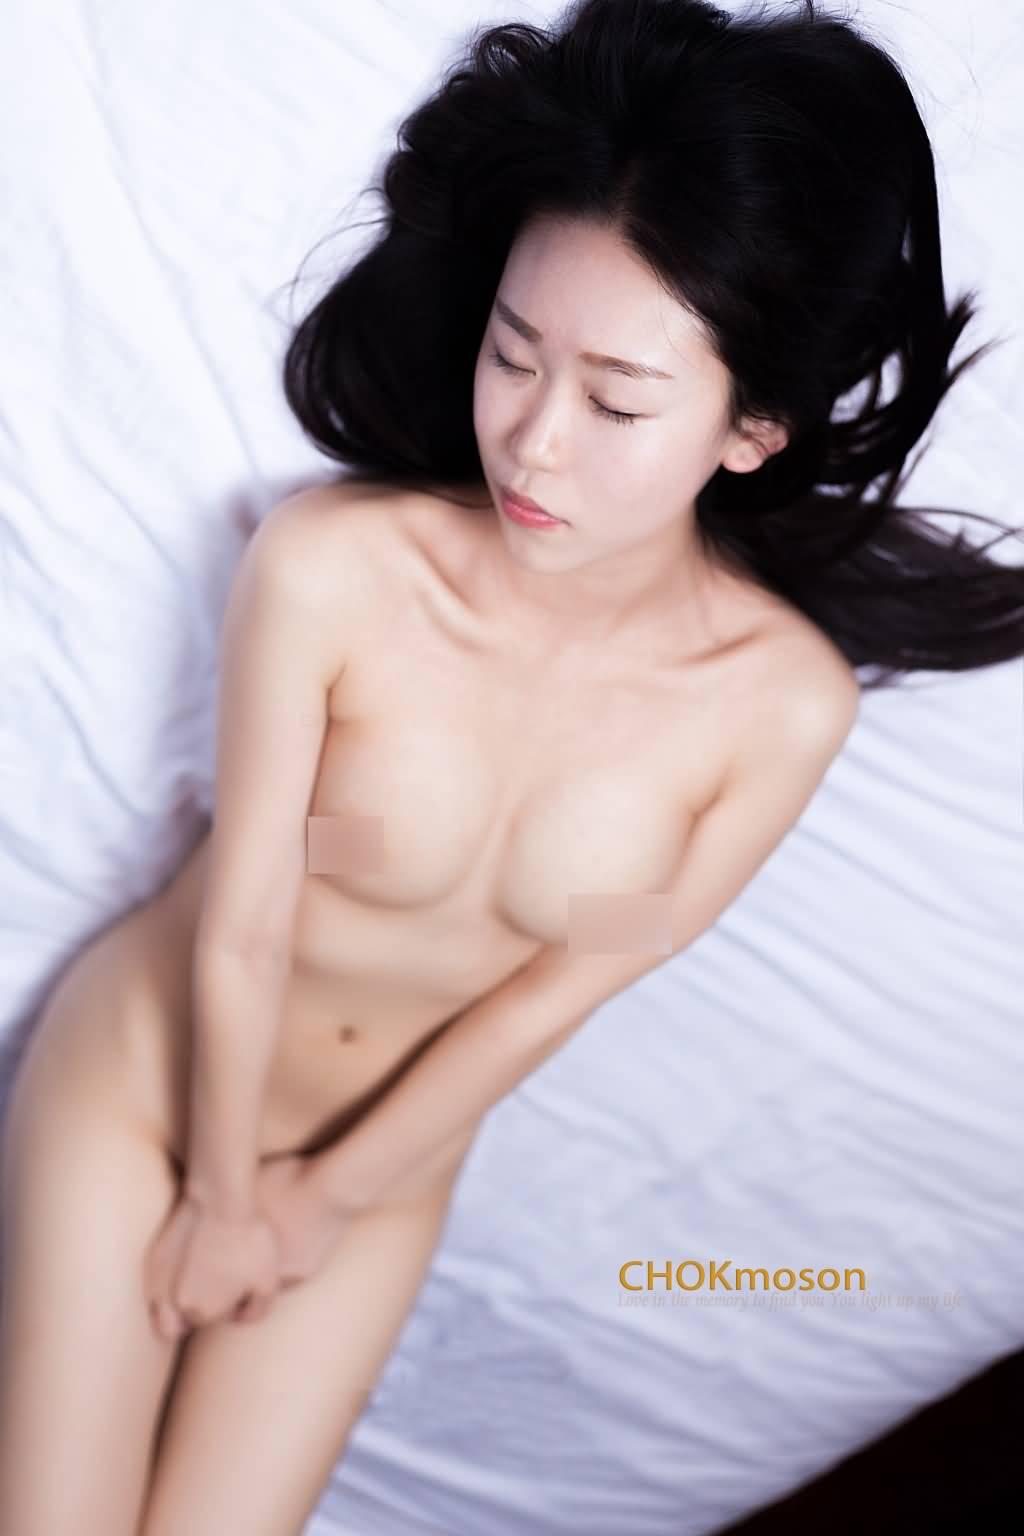 CHOKmoson脱神作品《李新 旅拍脱》[68P/729M]